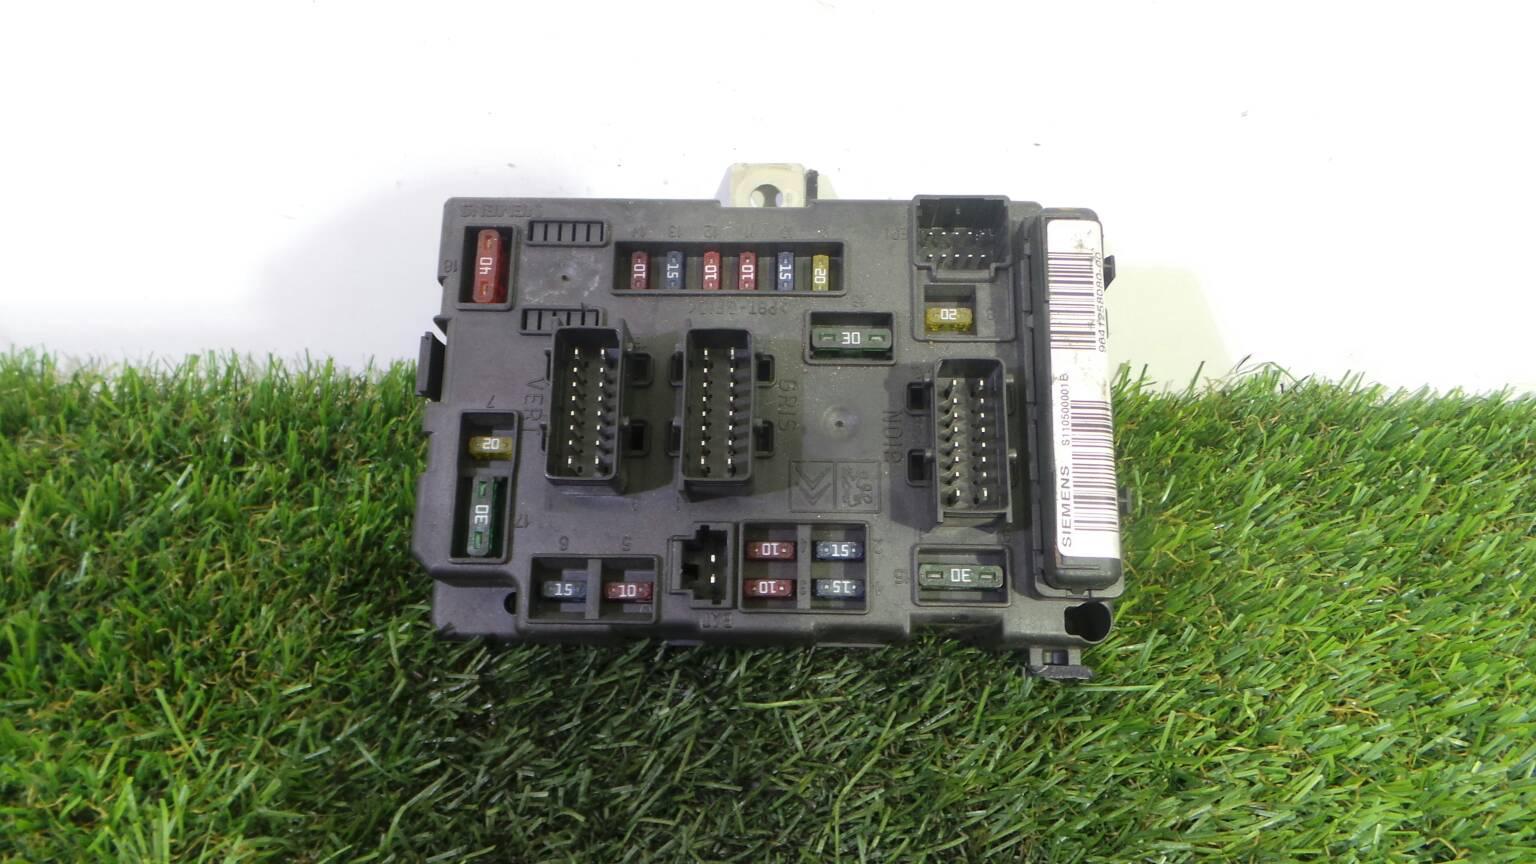 hight resolution of fuse box 9641258080 00 citro n c5 i dc 2 0 hdi dcrhzb